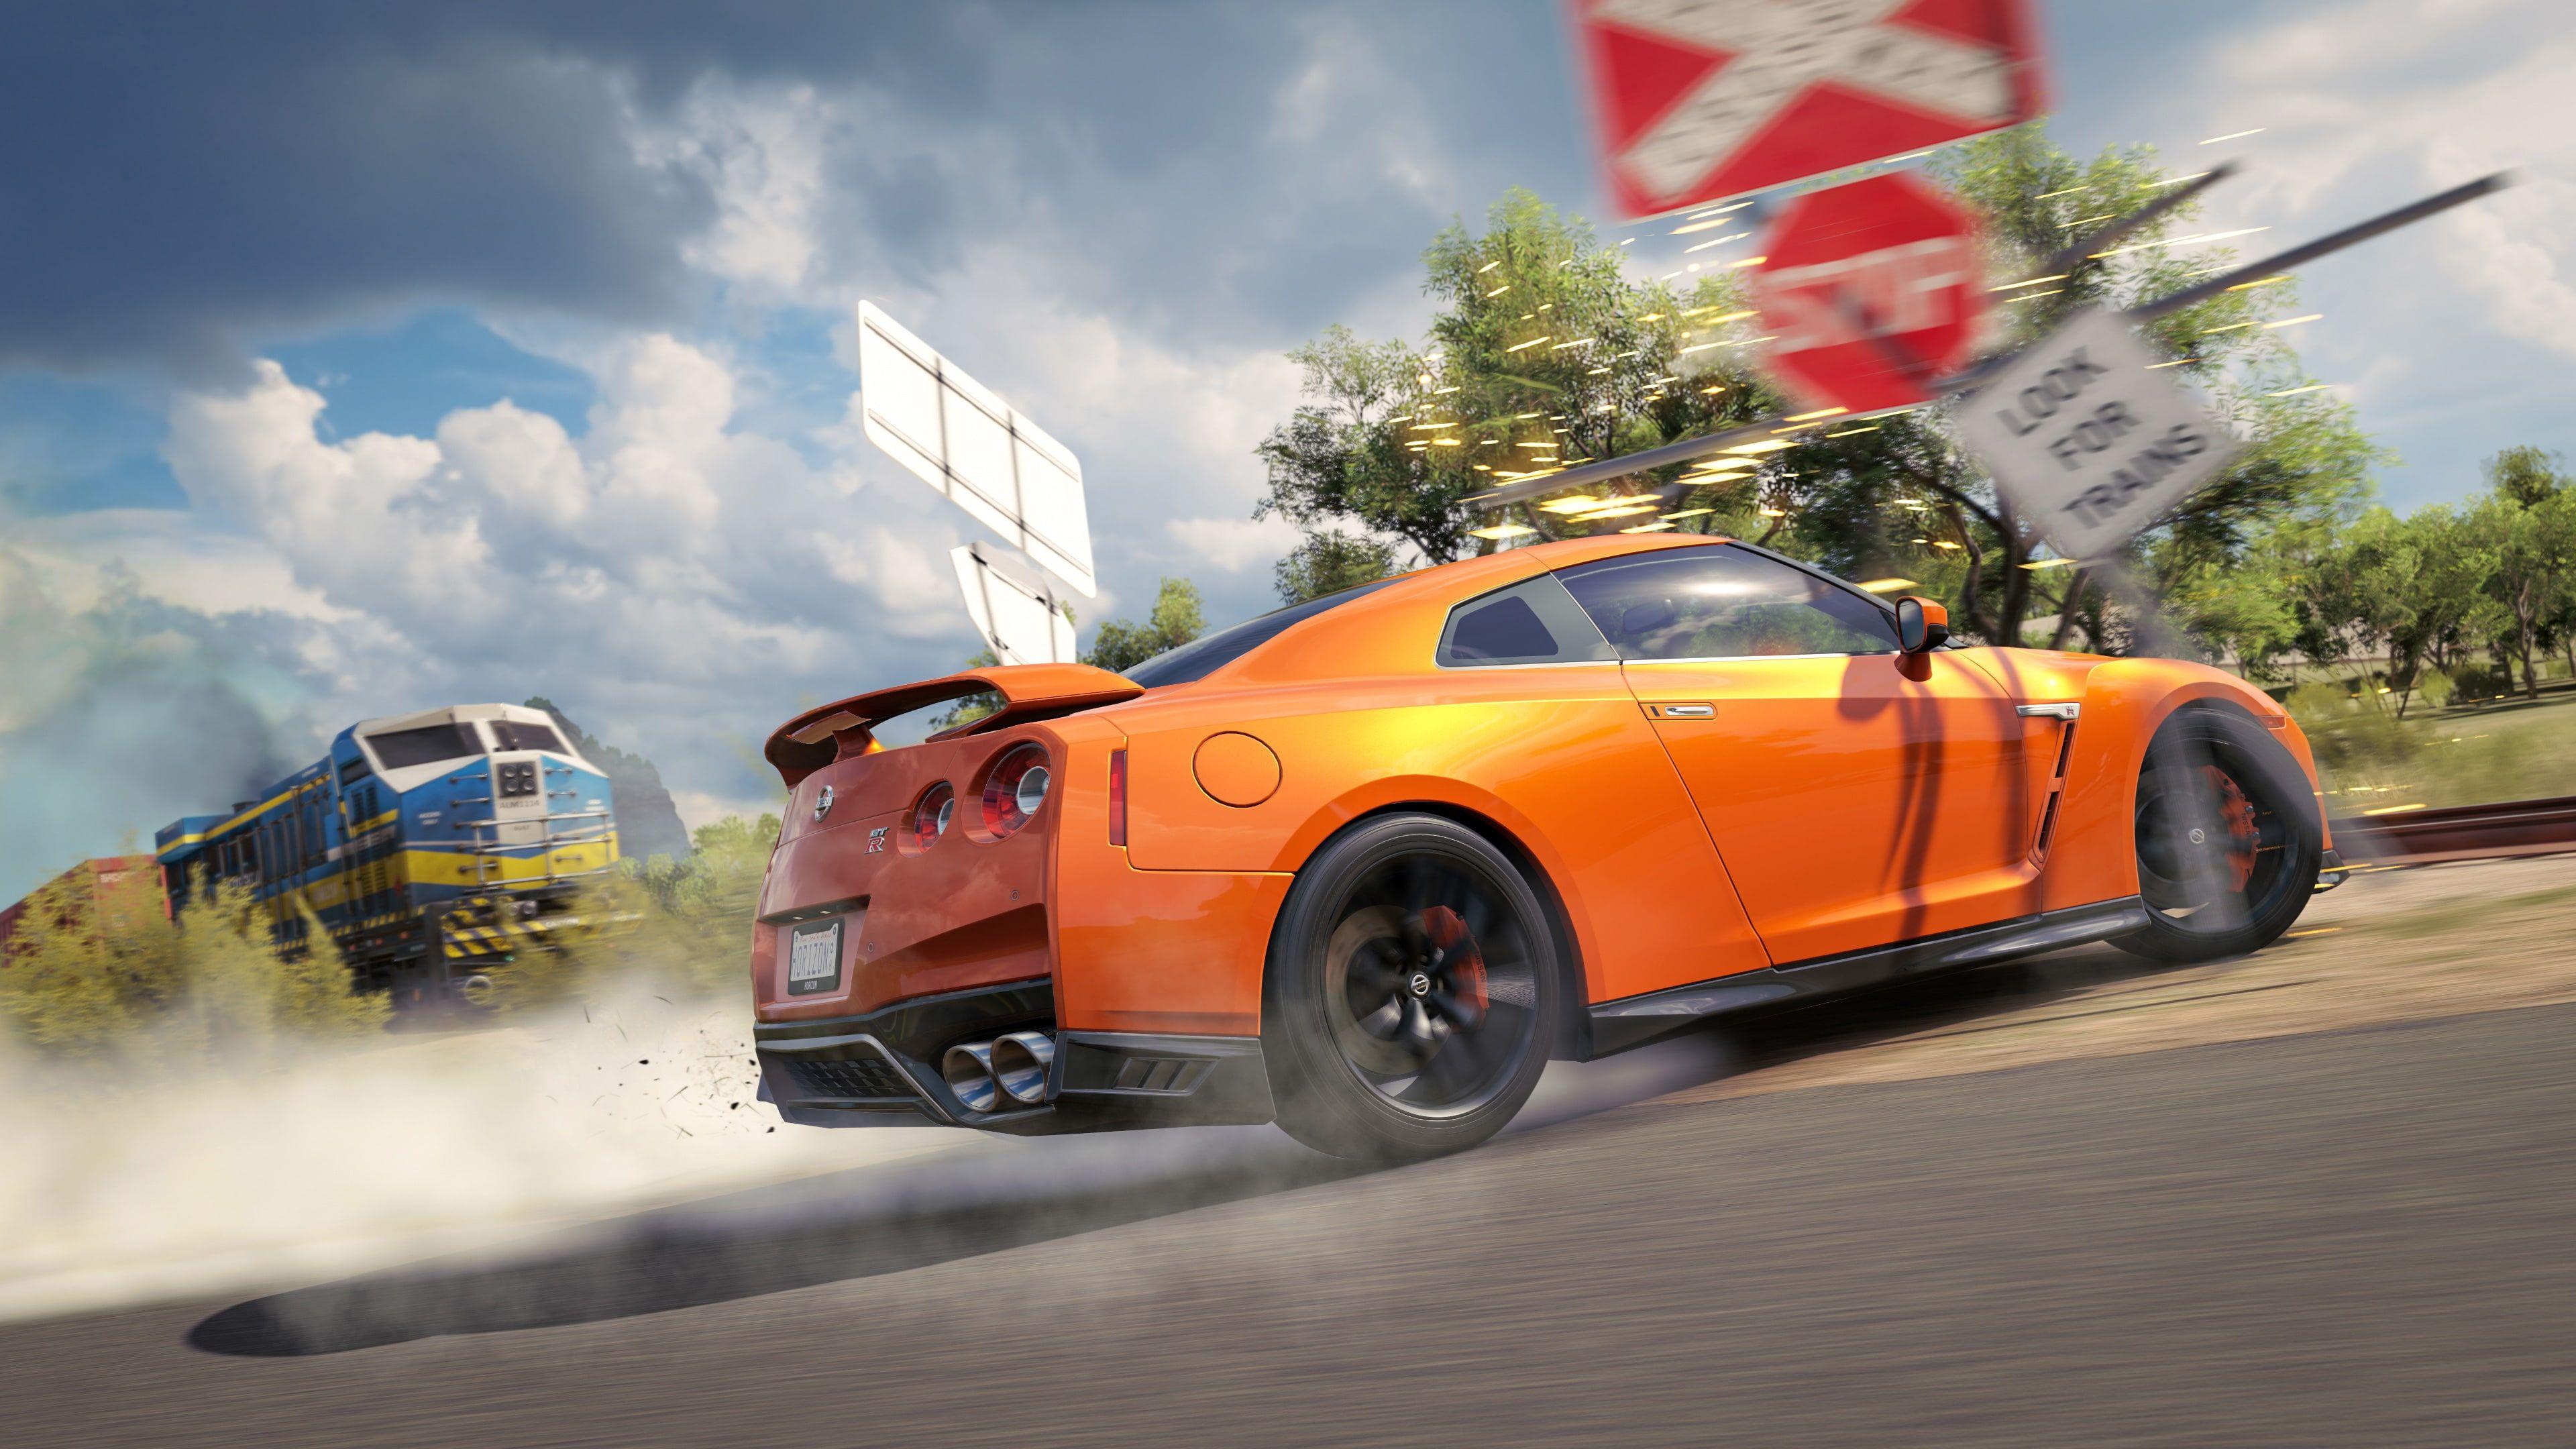 Forza Horizon 3 Nissan Gtr Drift 4k Forza horizon 3